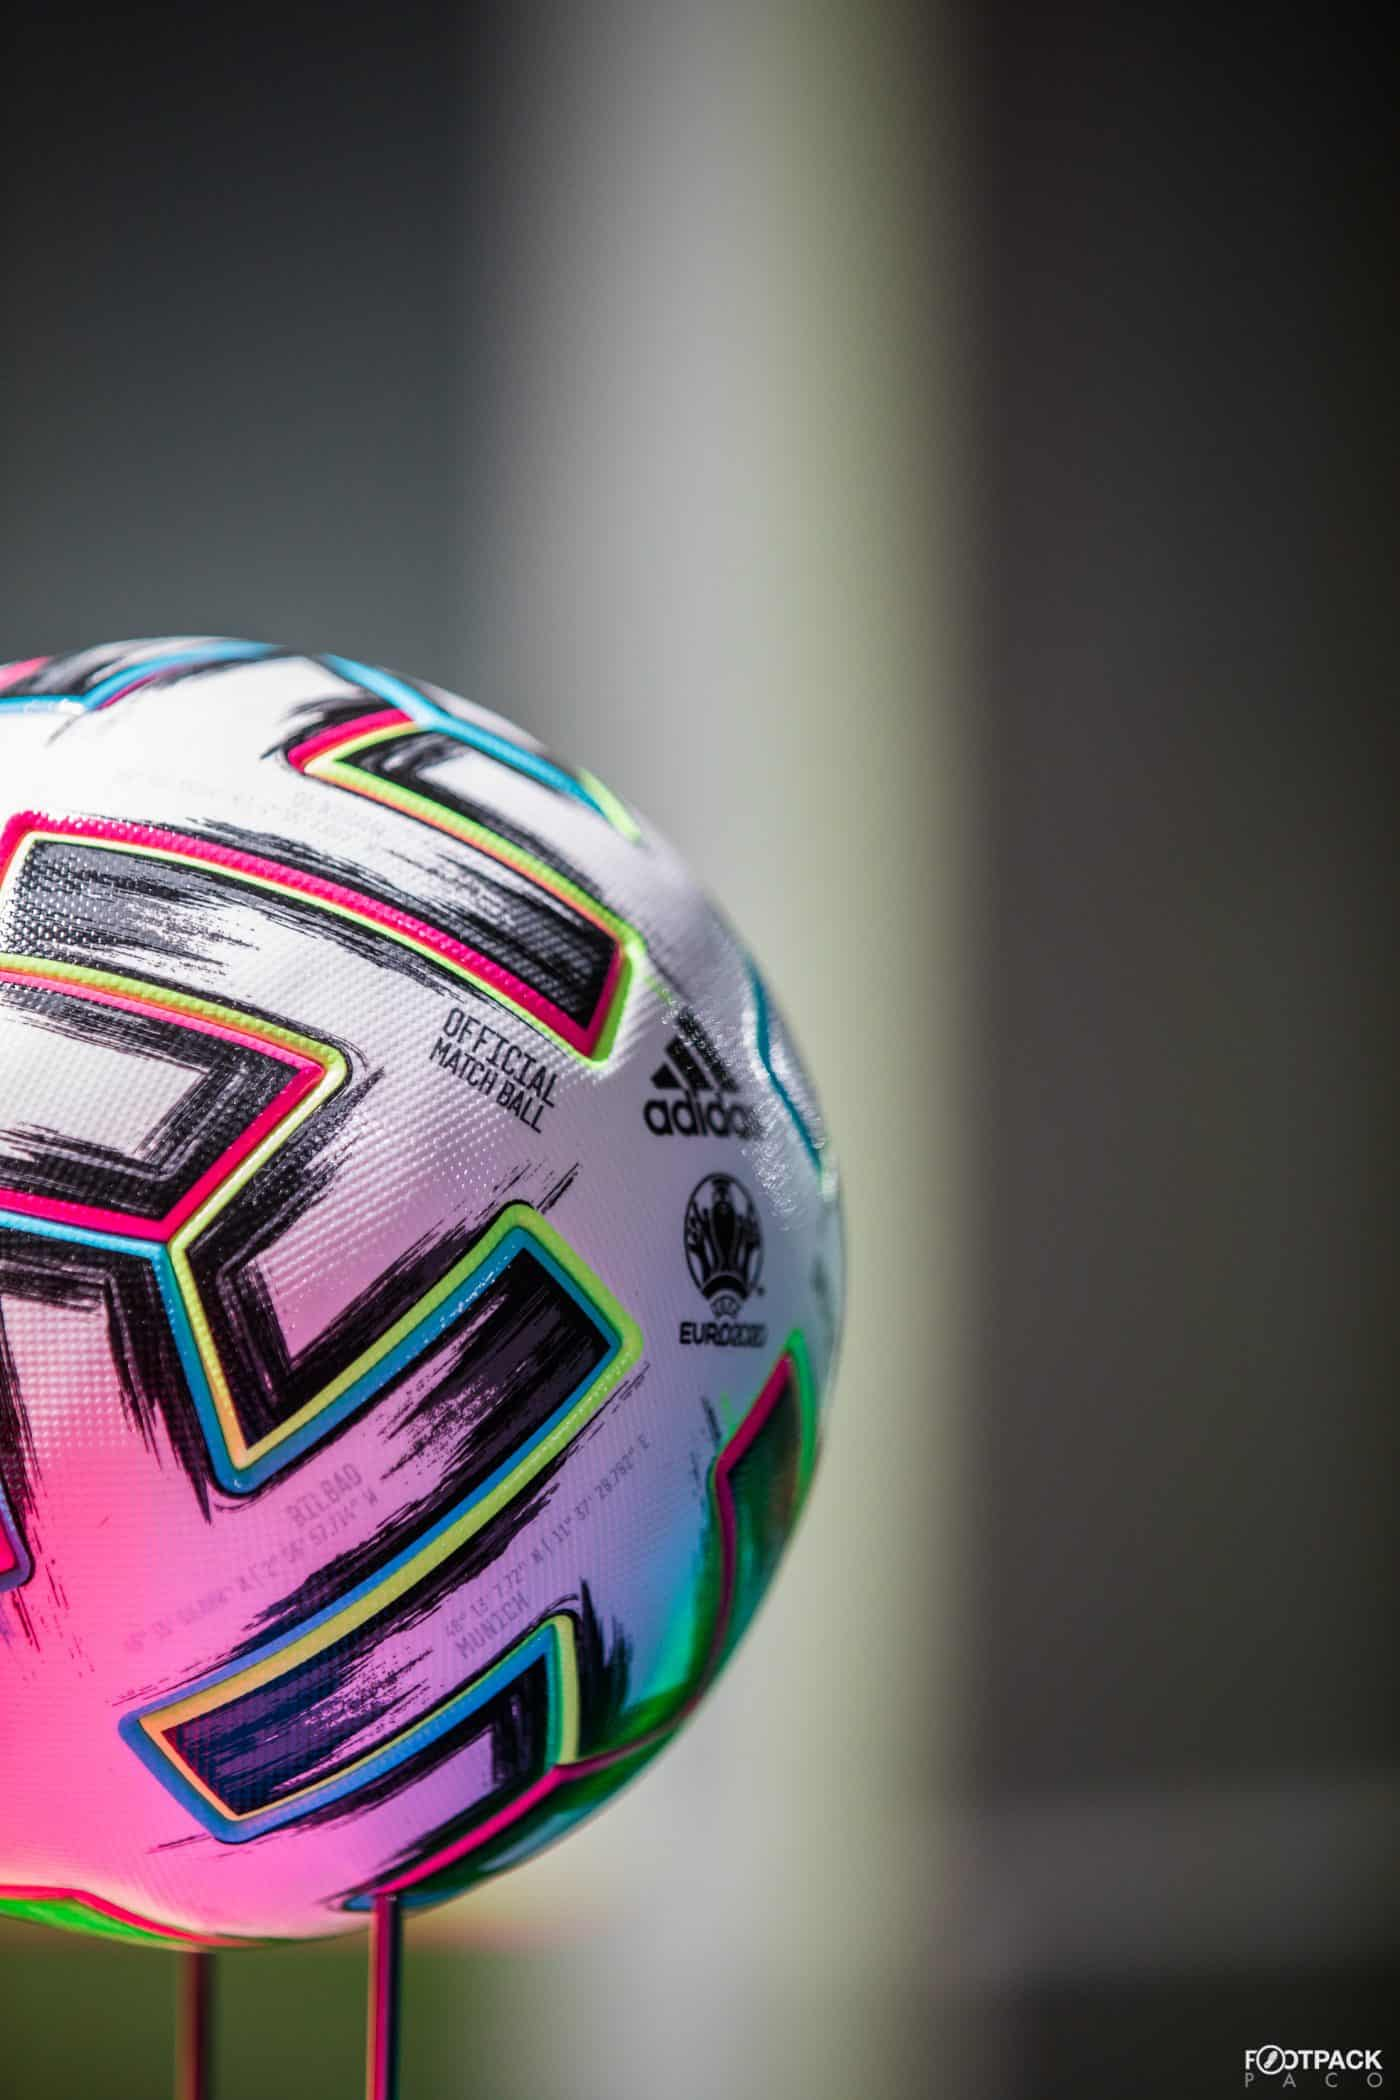 ballon-adidas-euro-2020-uniforia-footpack-2